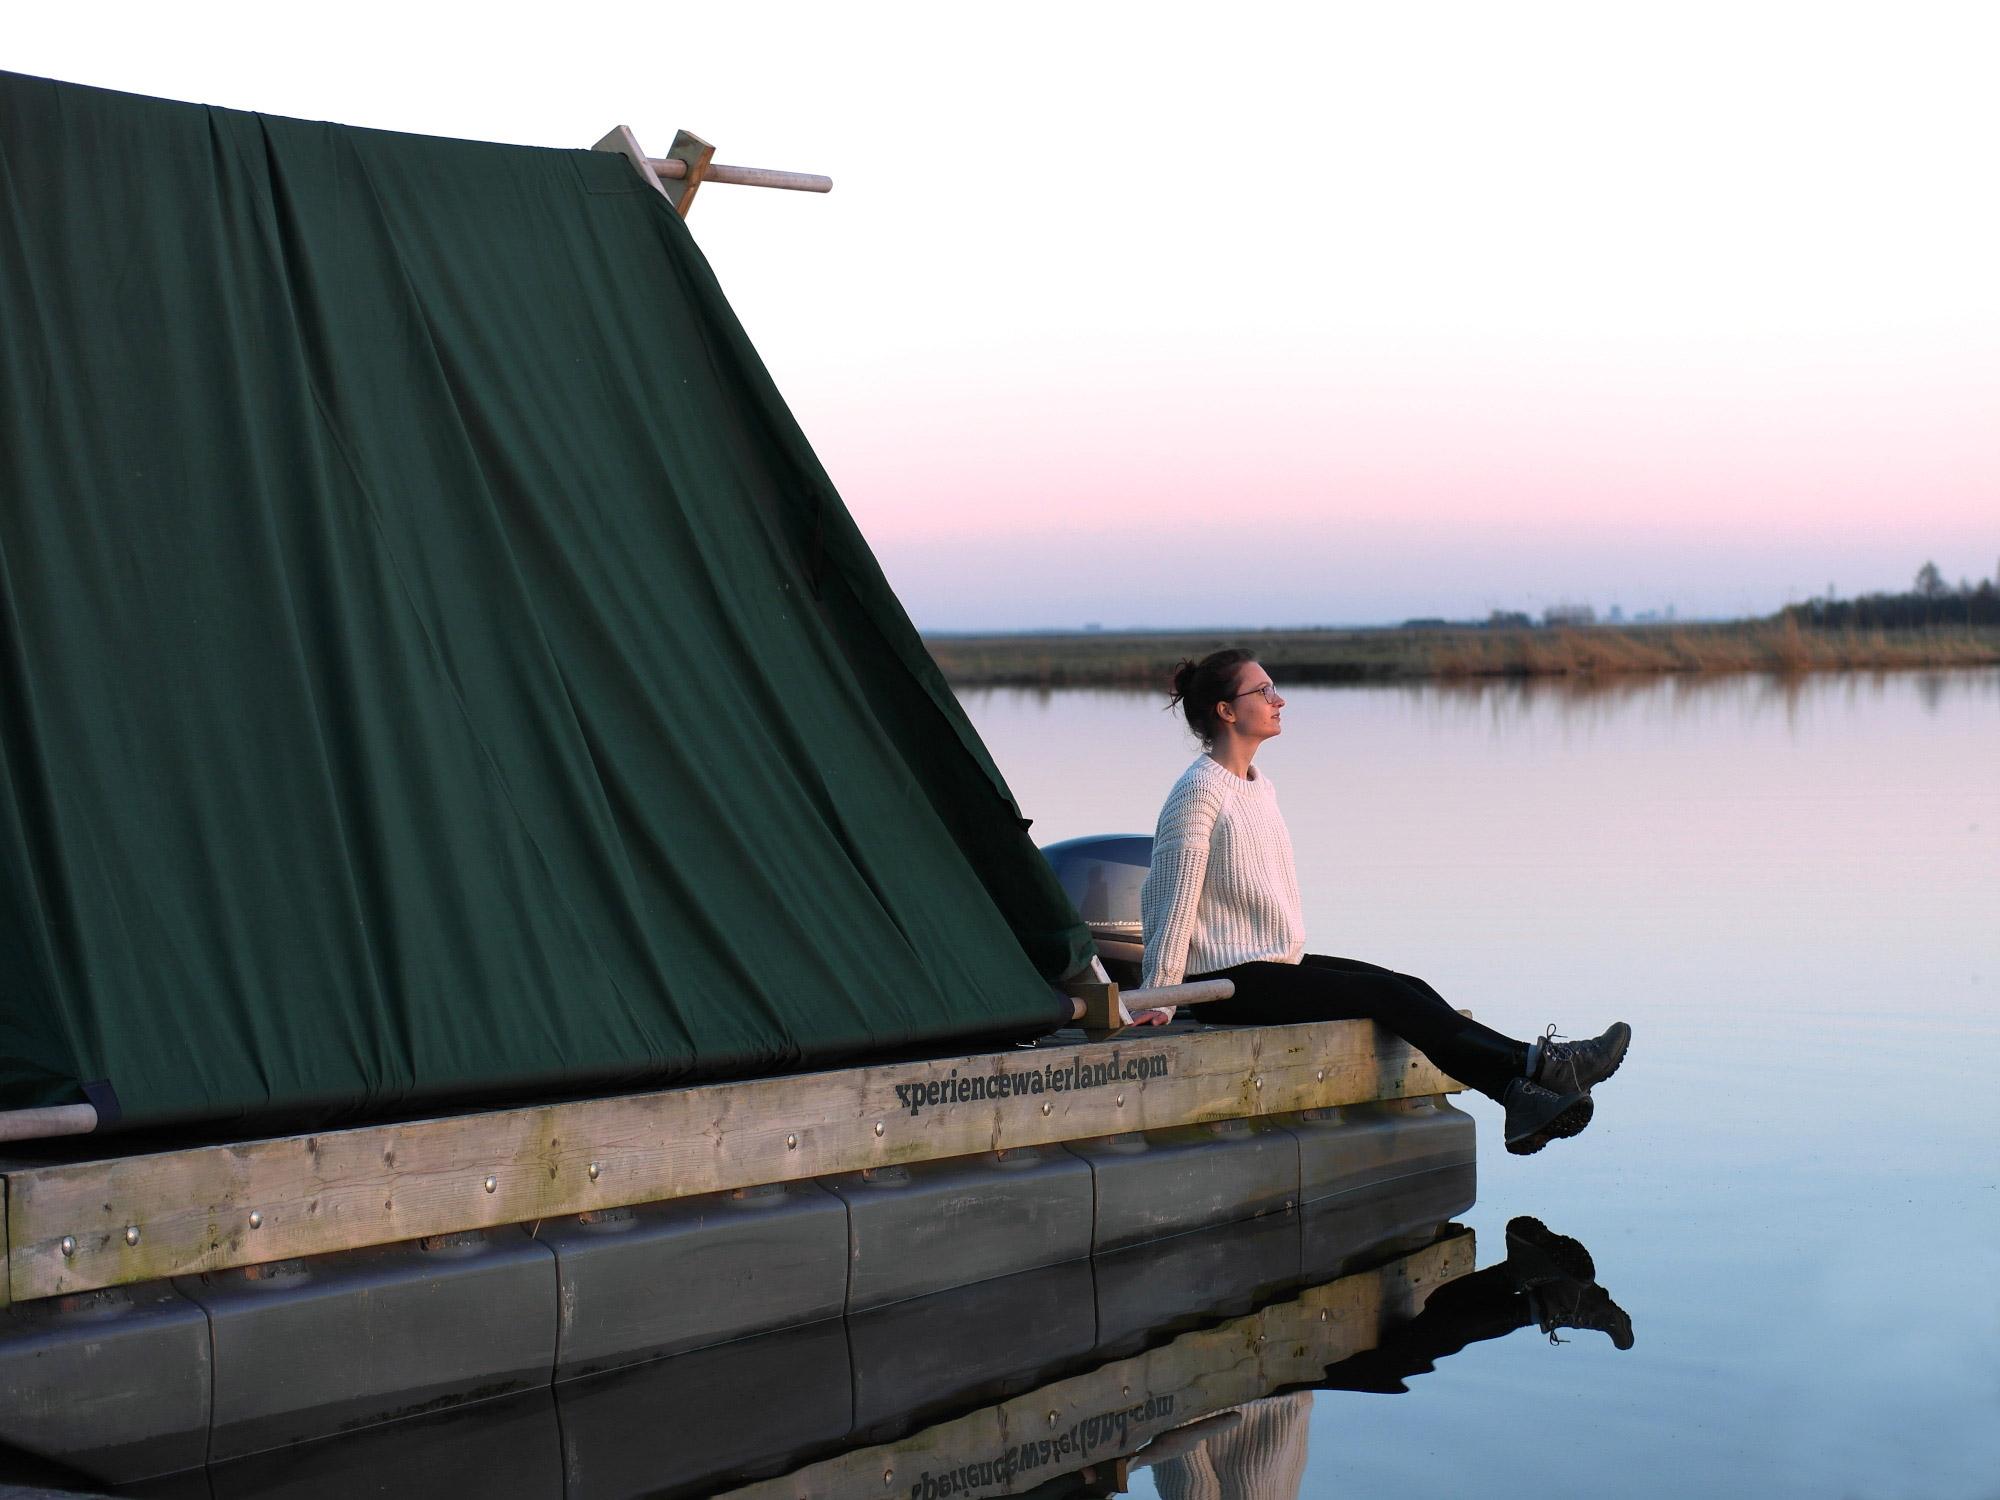 Janna - Kampeervlot in Waterland (c) Kerstin Beck